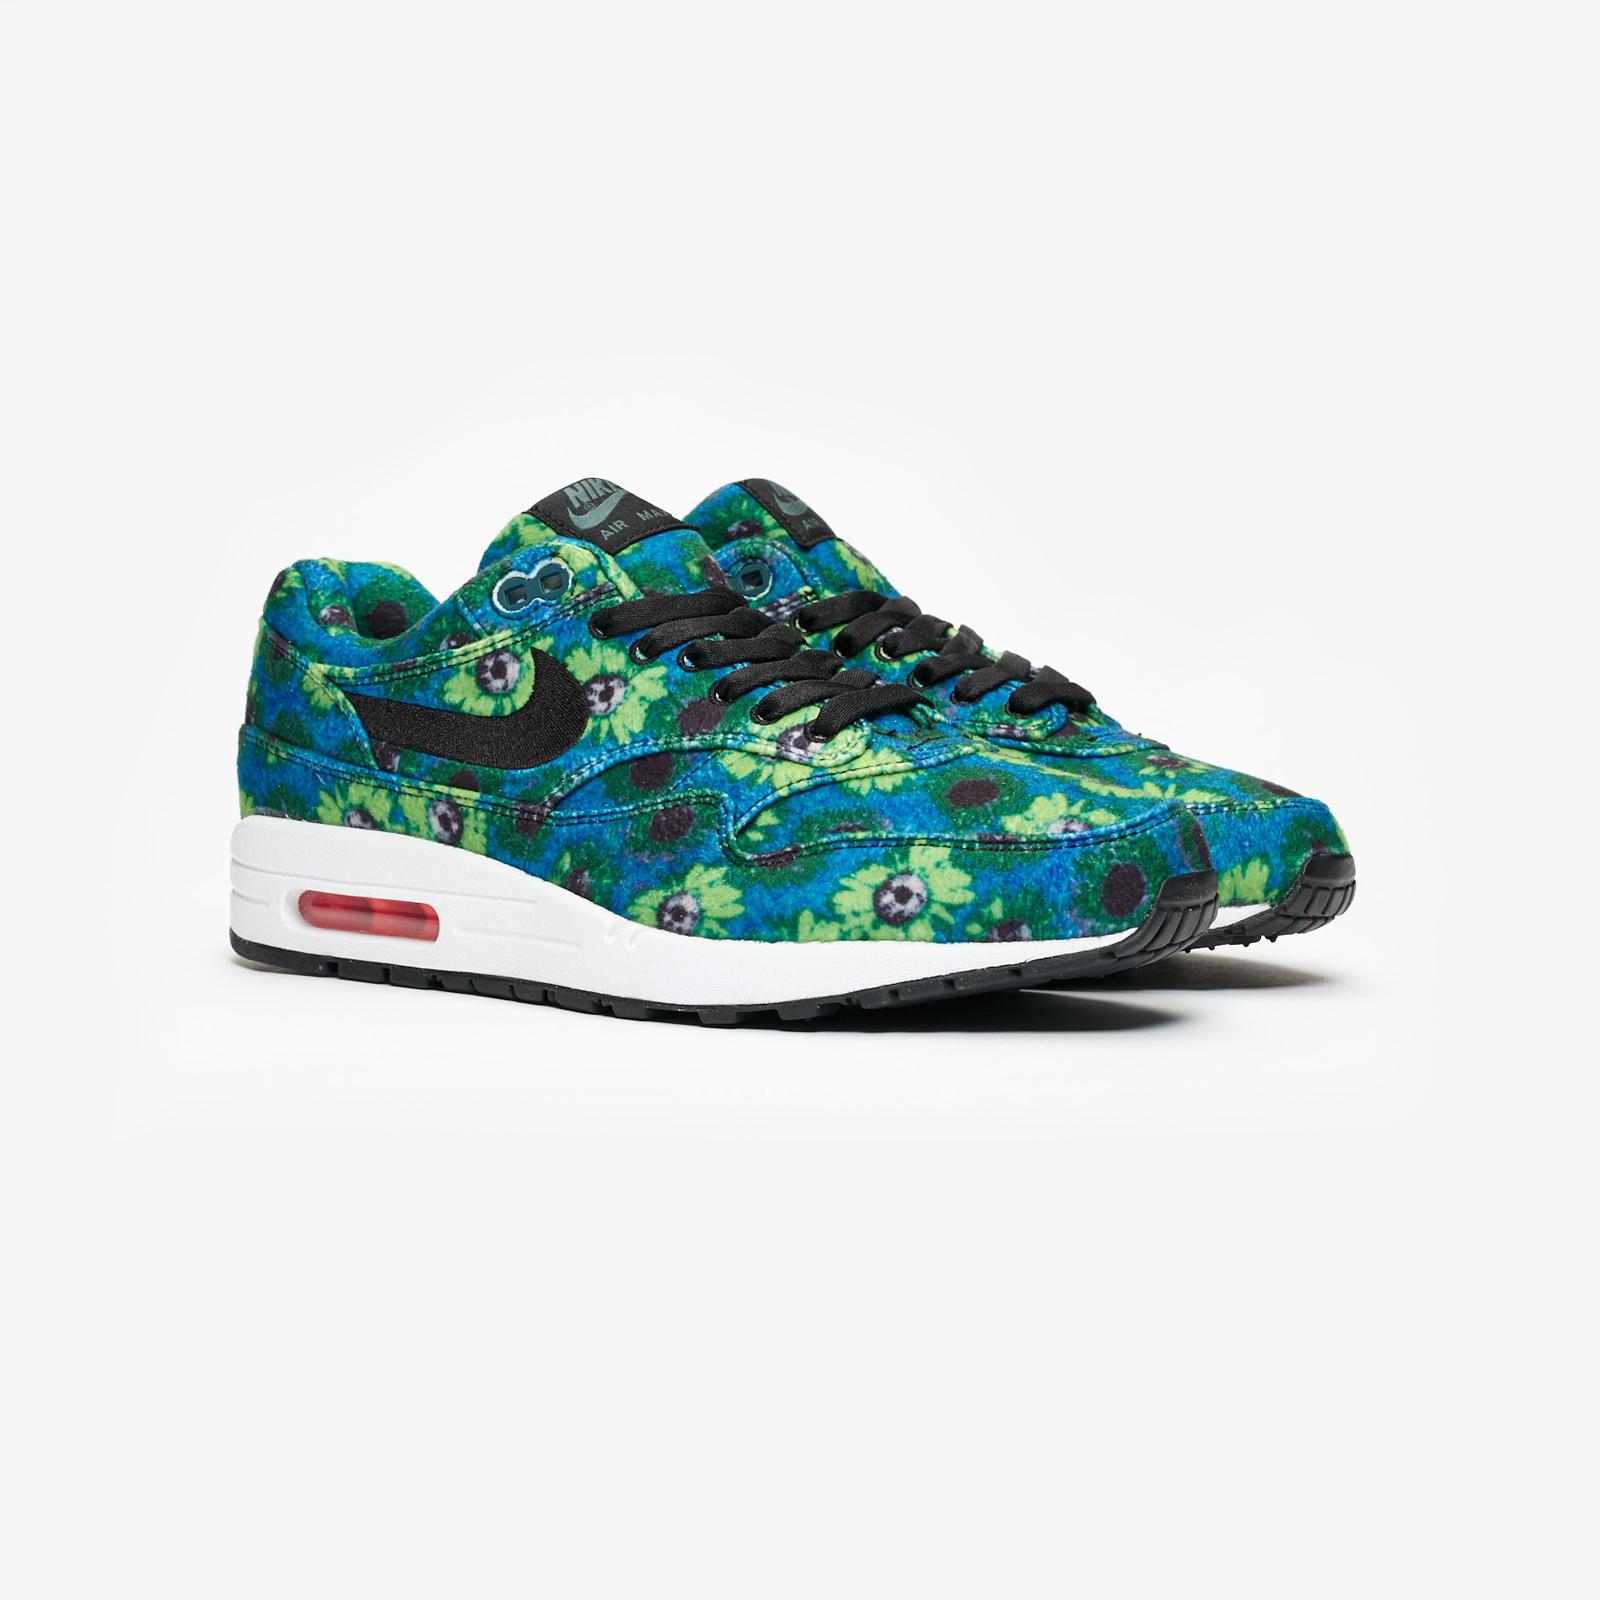 5a6f14ab5caee Nike Air Max 1 Premium SE - 858876-002 - Sneakersnstuff